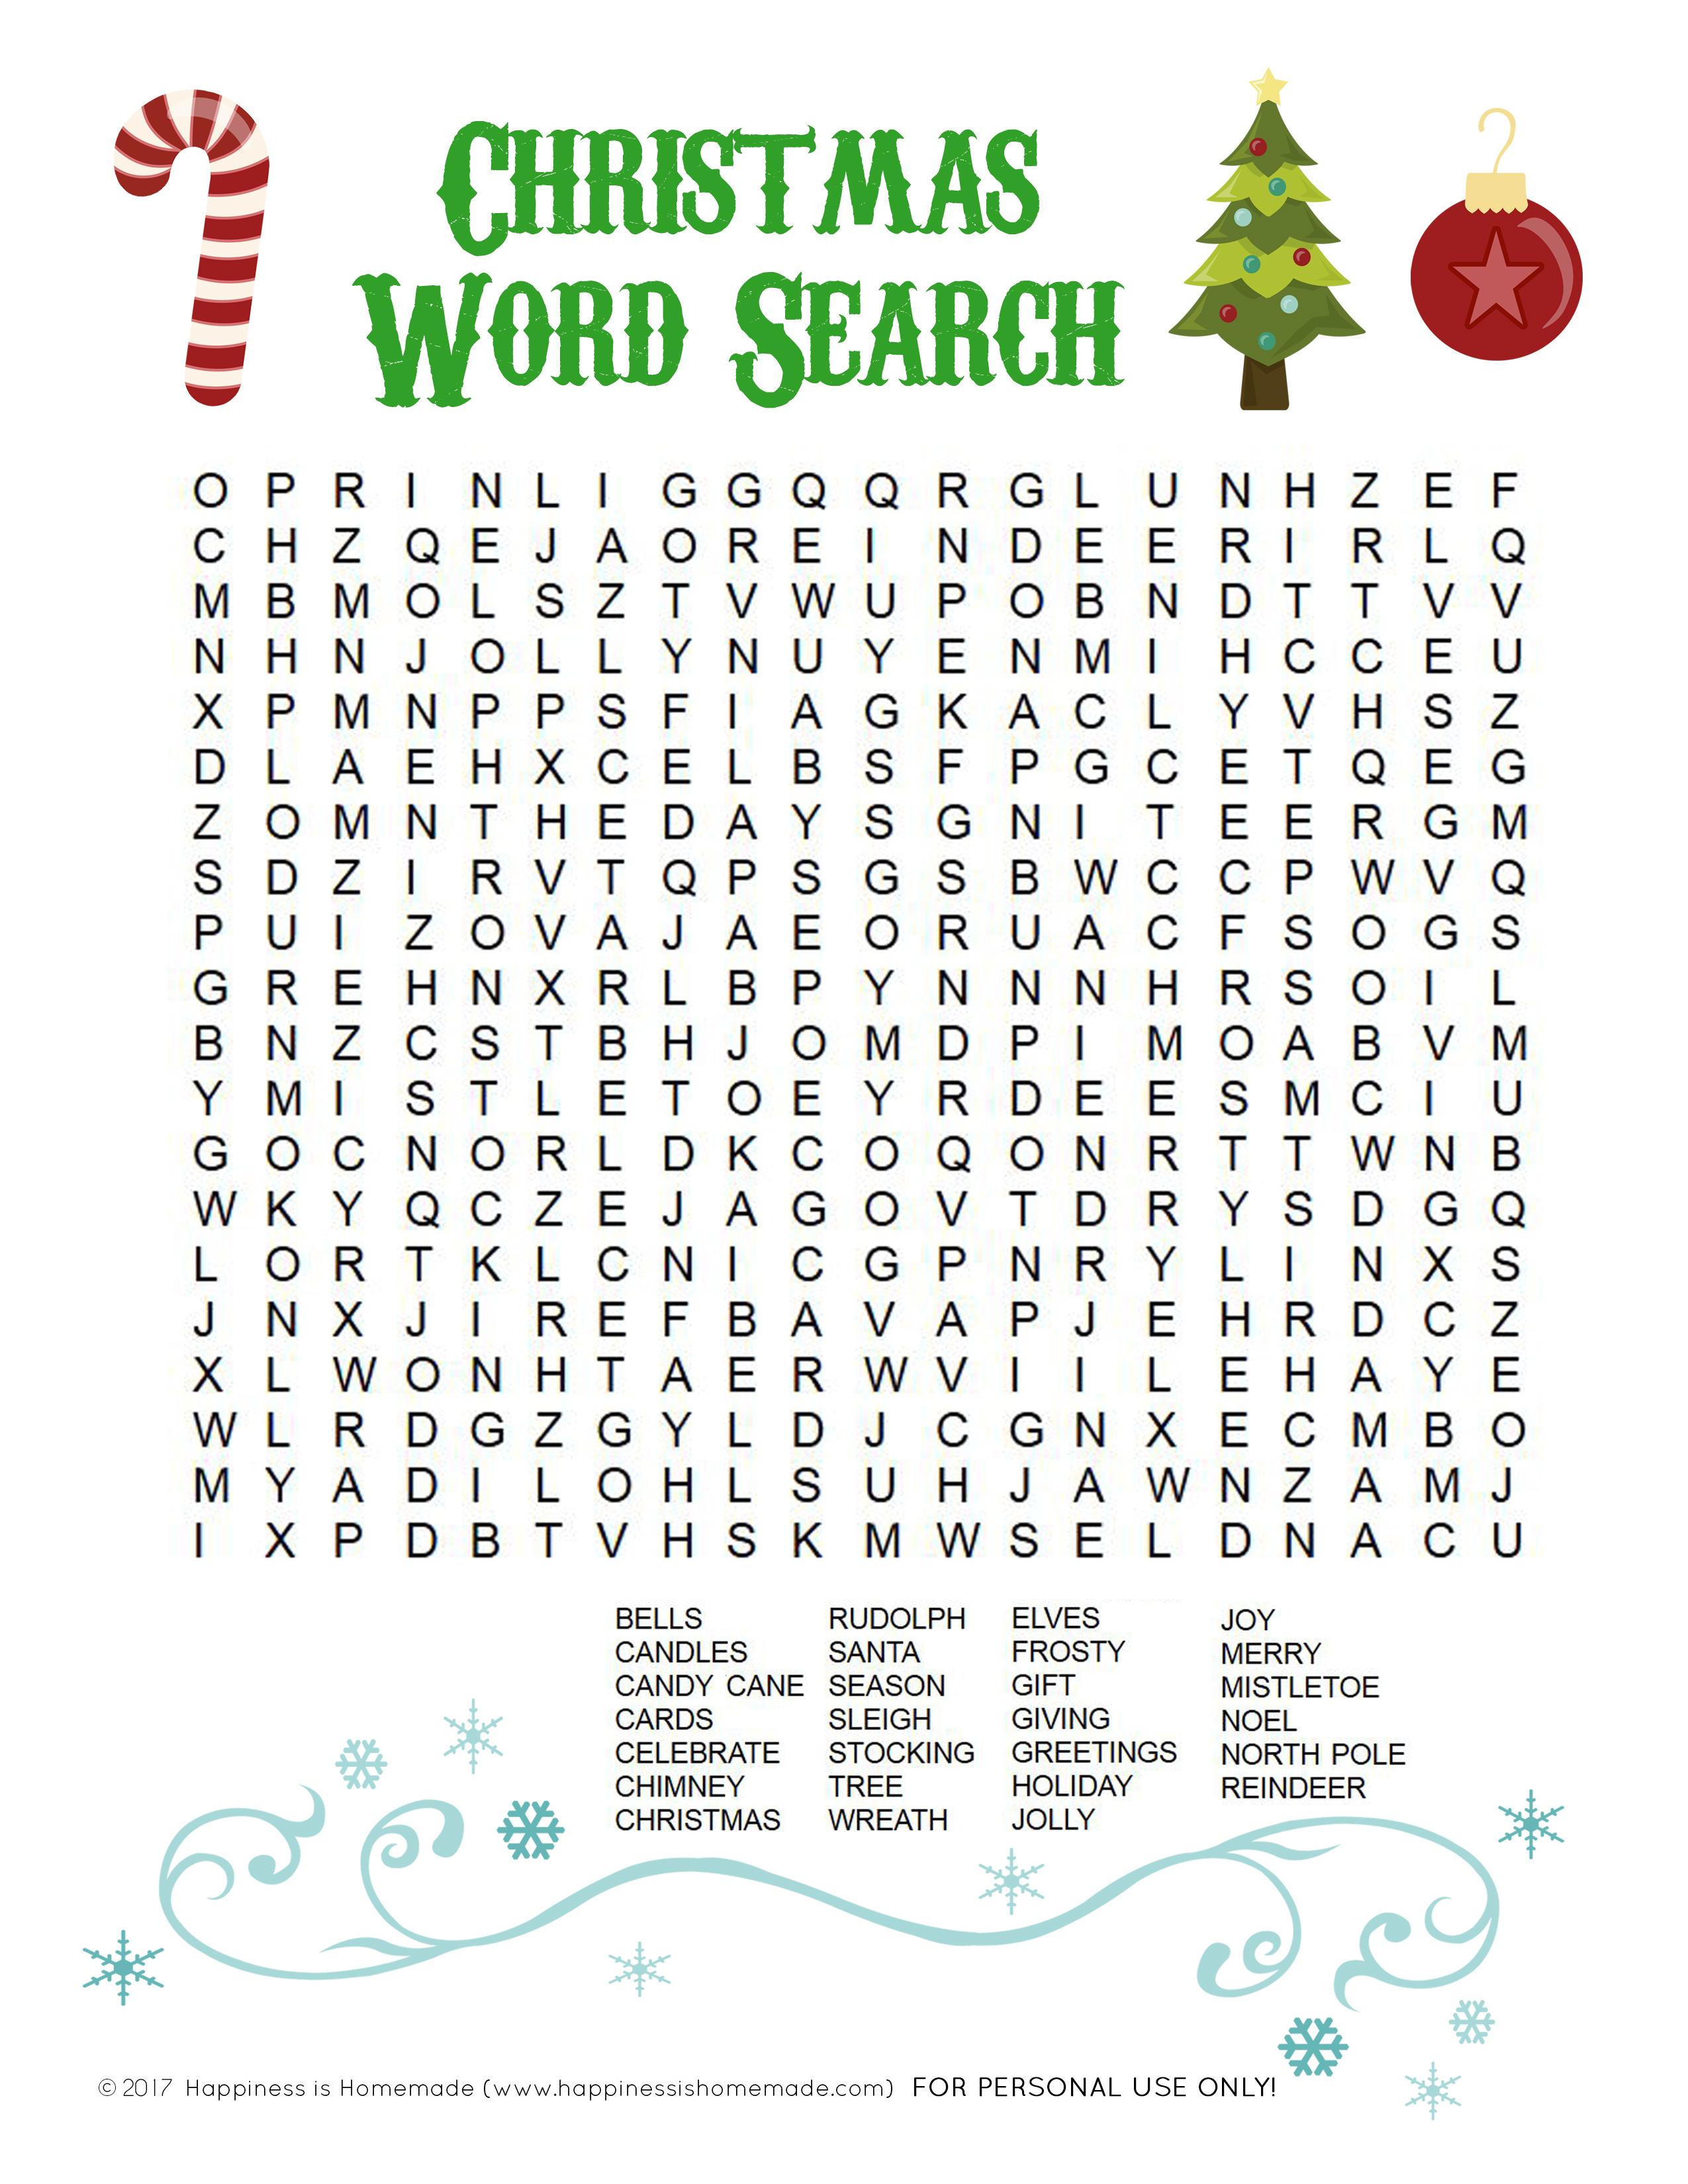 Printable Christmas Word Search For Kids & Adults - Happiness Is - Printable Christmas Crossword Puzzles For Adults